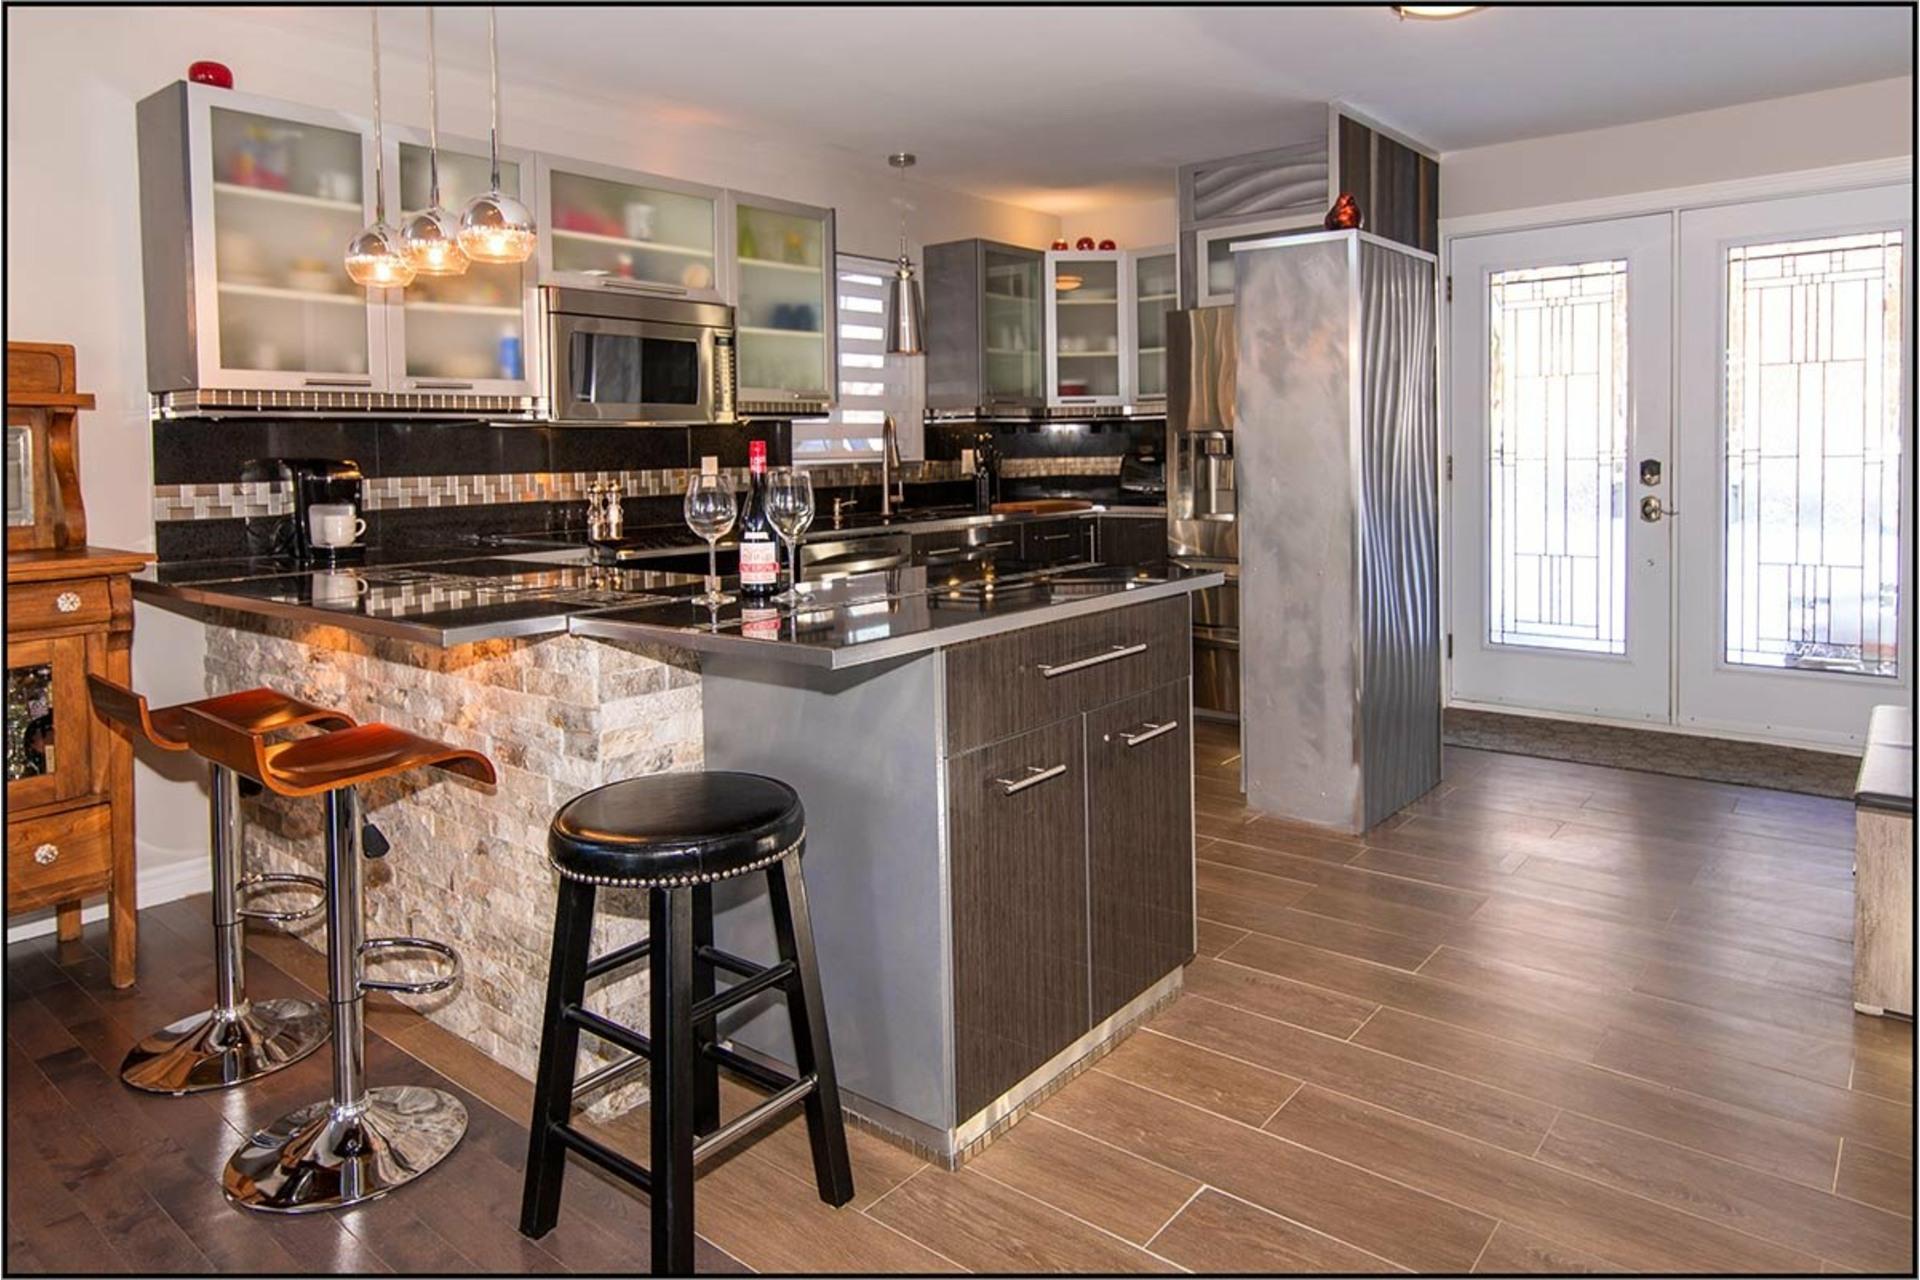 image 2 - House For sale Sainte-Foy/Sillery/Cap-Rouge Québec  - 13 rooms